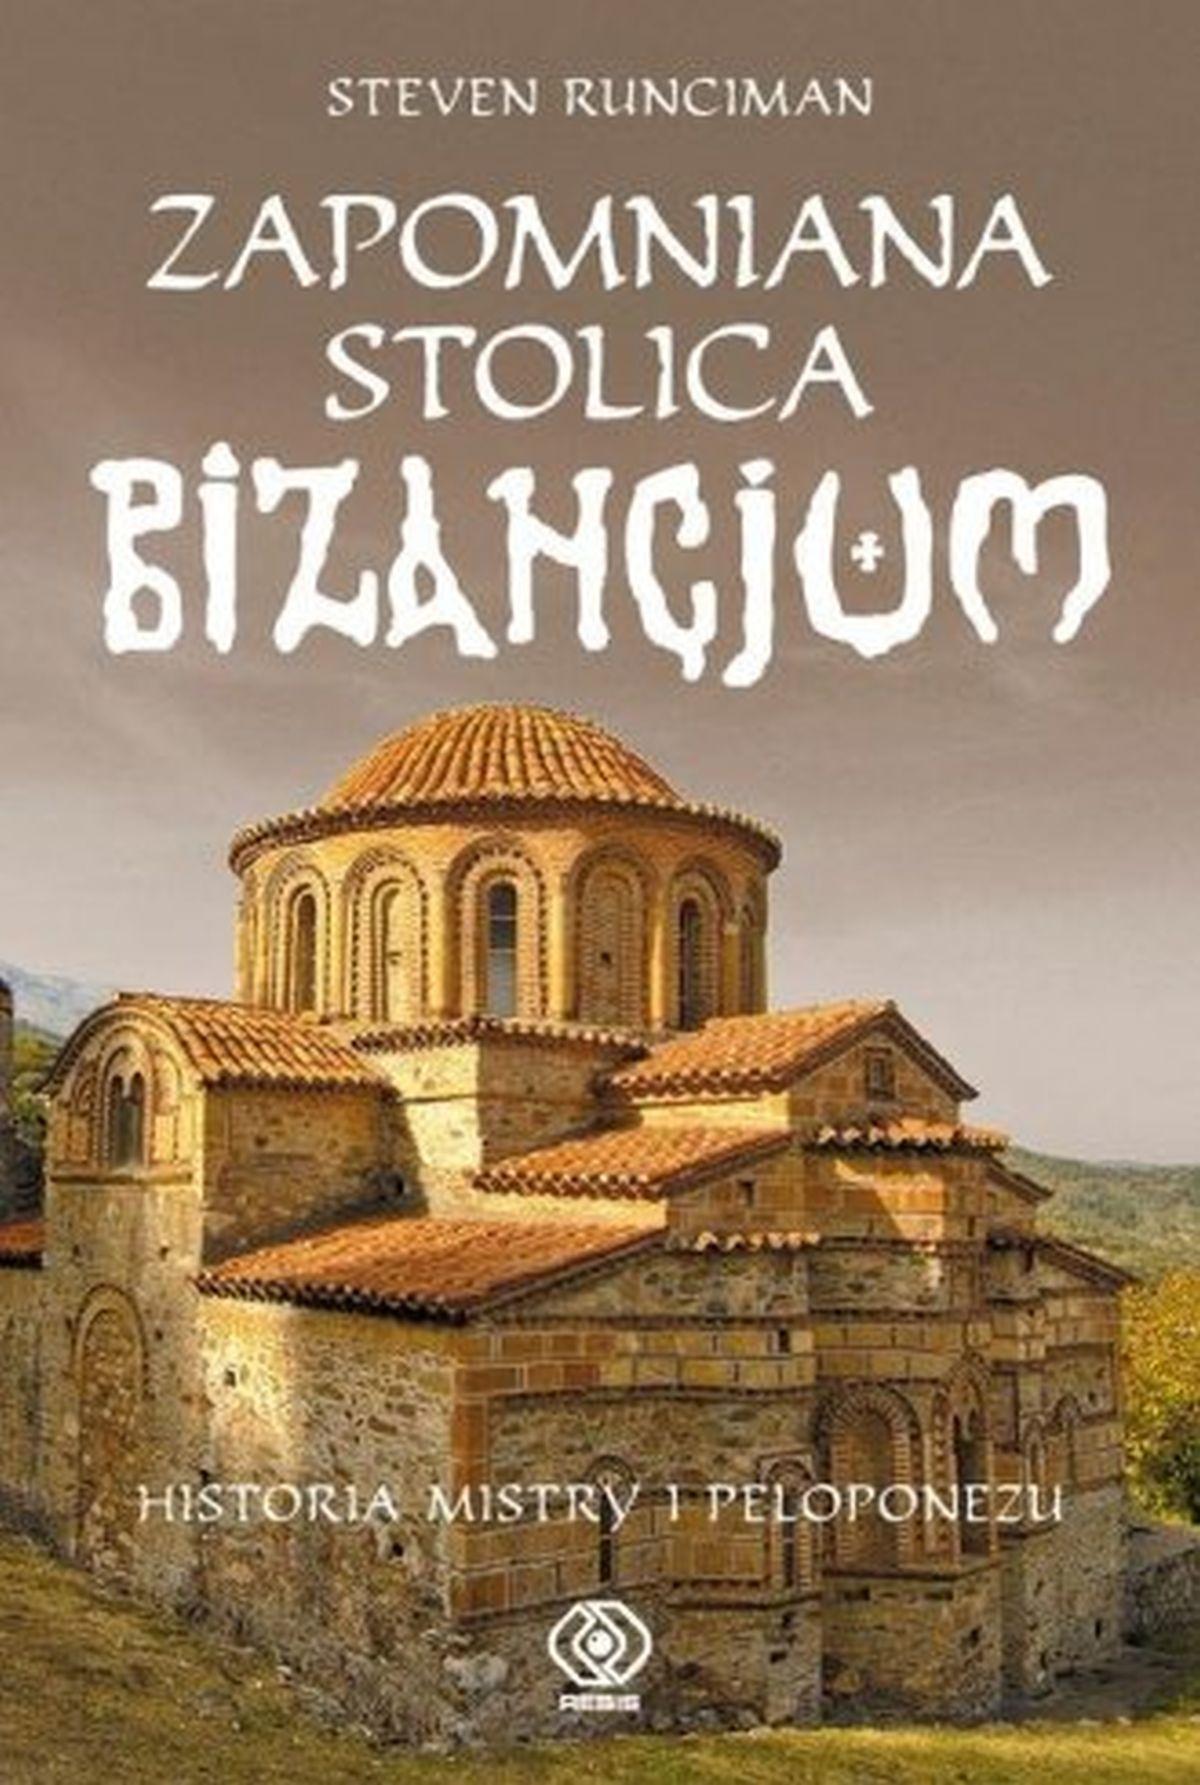 Steven Runciman, Zapomniana stolica Bizancjum. Historia Mistry i Peloponezu